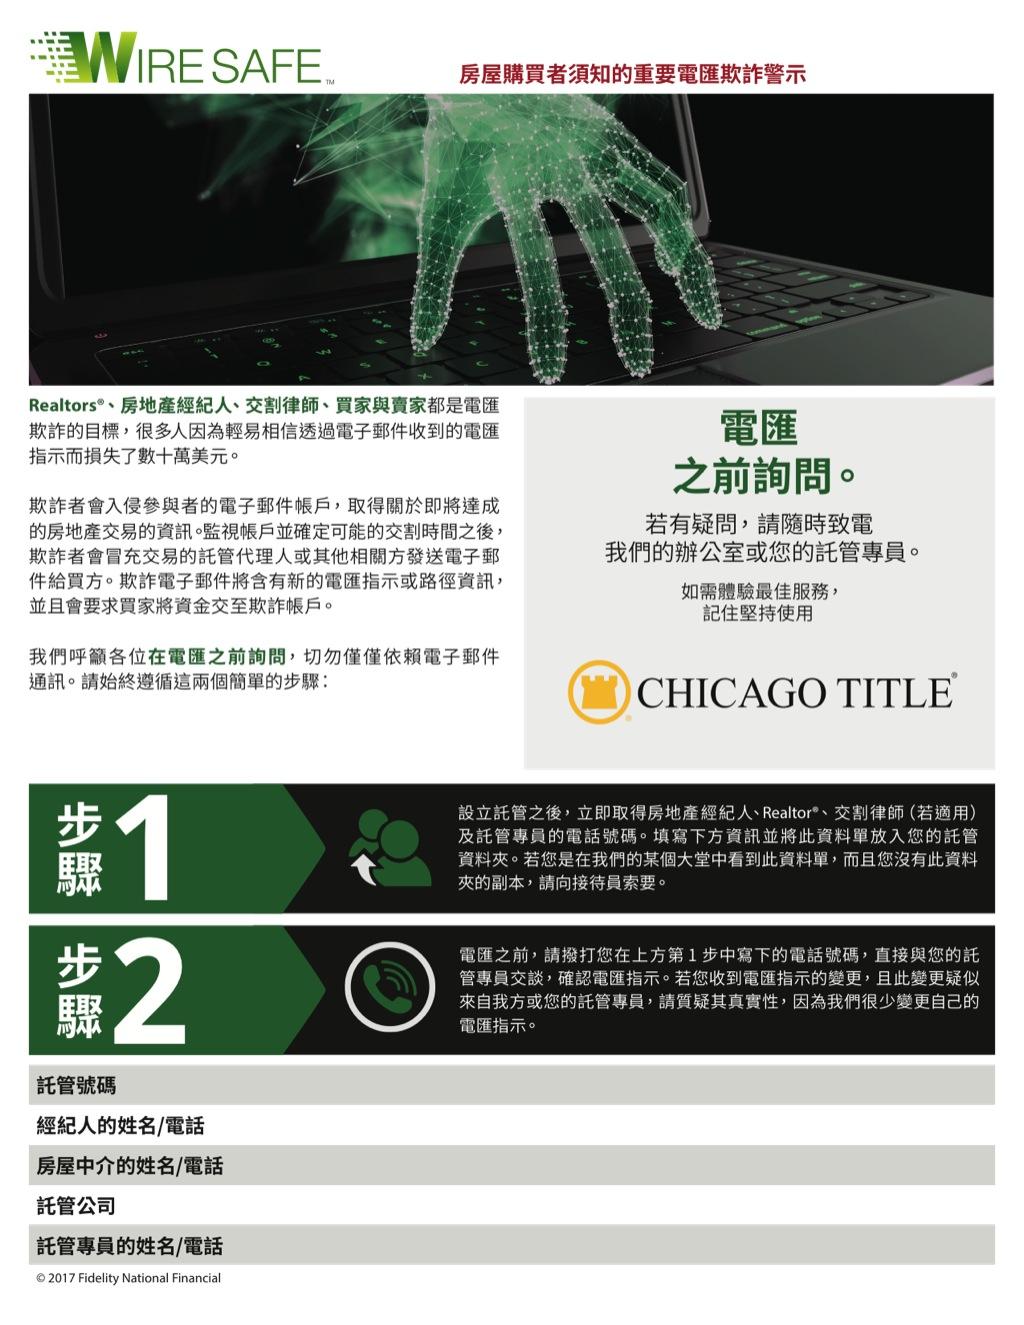 Corefact Wire Safe Buyer Flyer - Cantonese - CTT